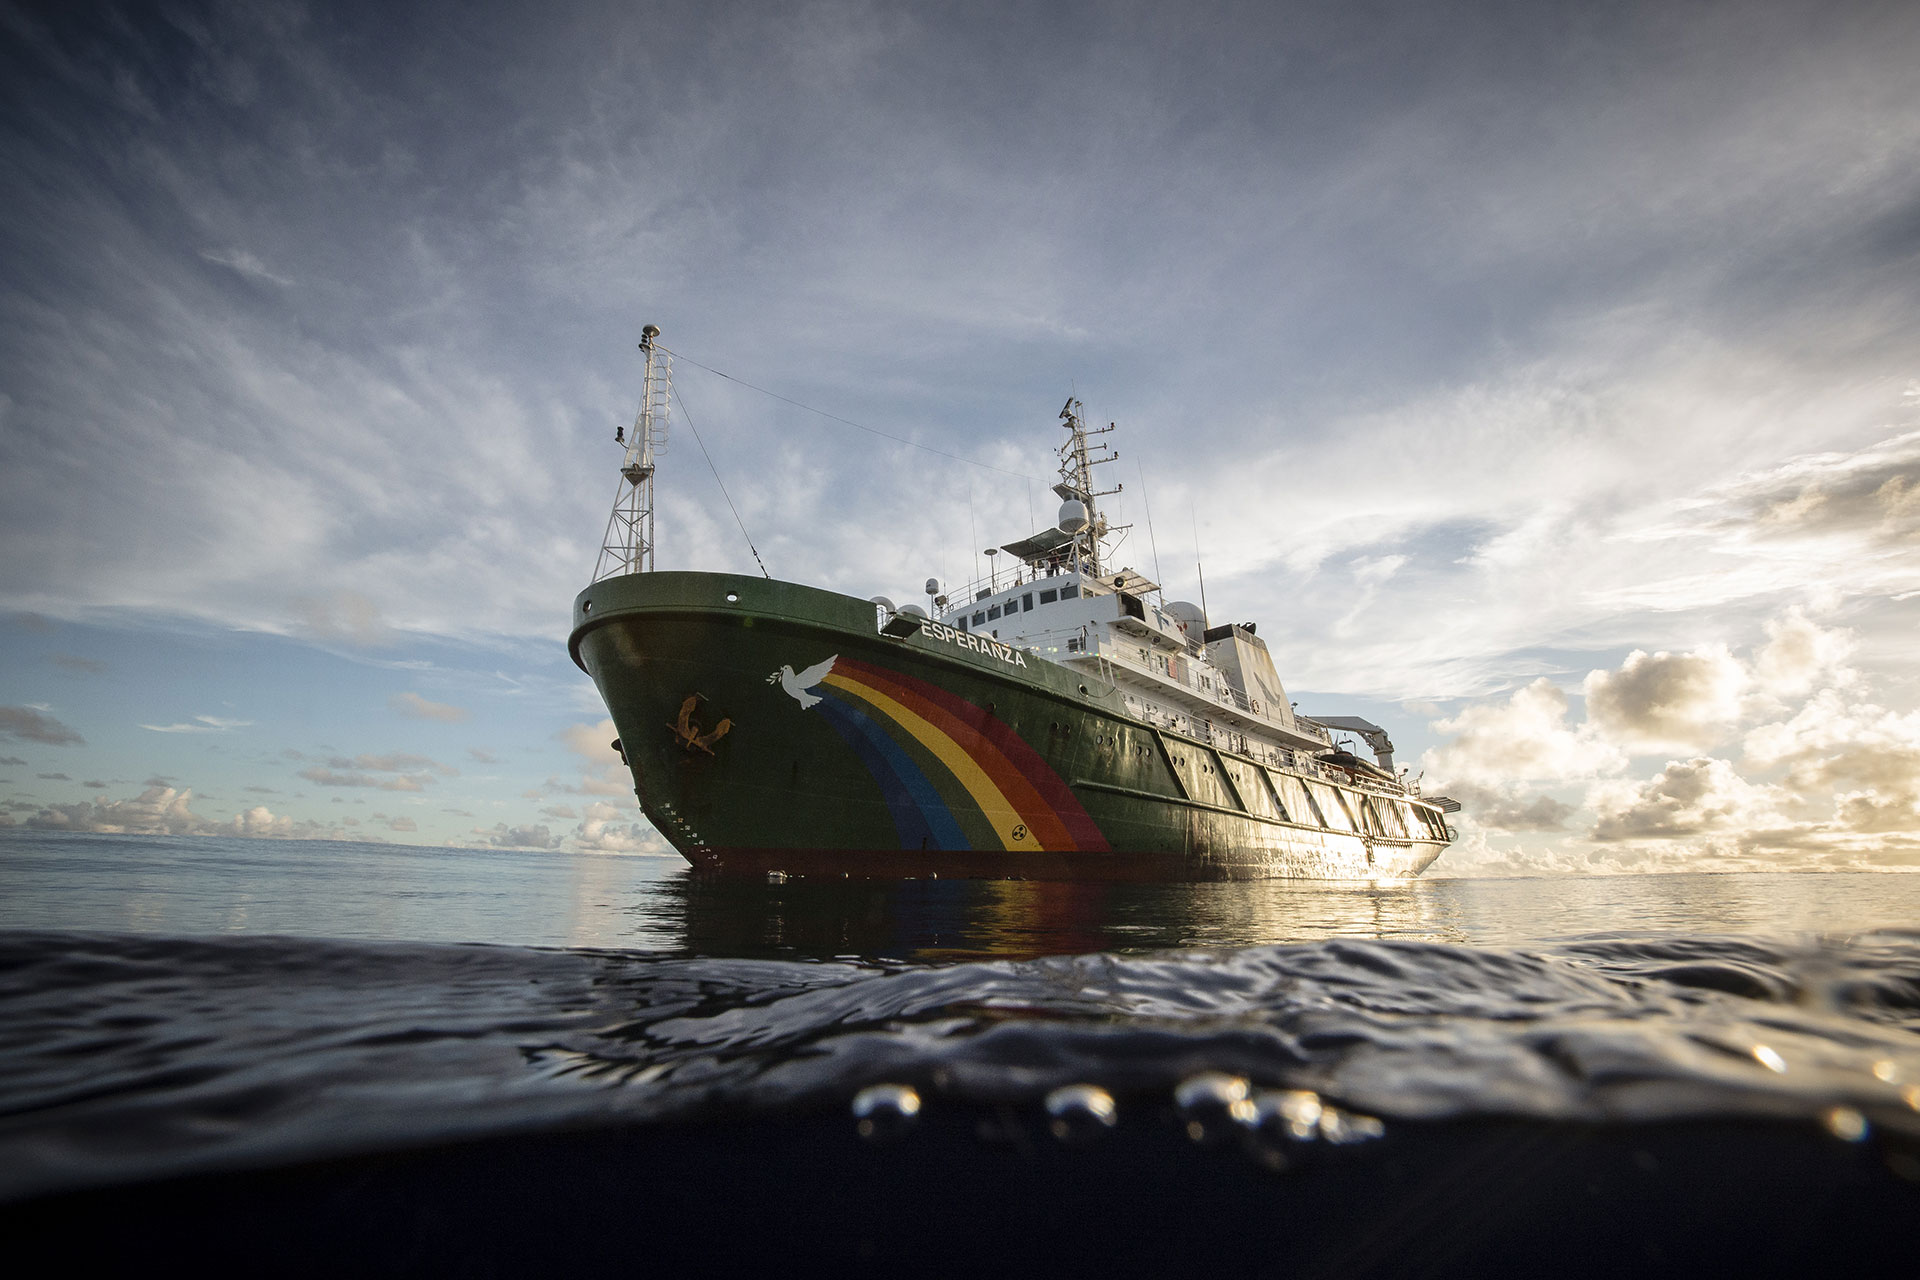 MY Esperanza in the Indian Ocean. © Will Rose / Greenpeace